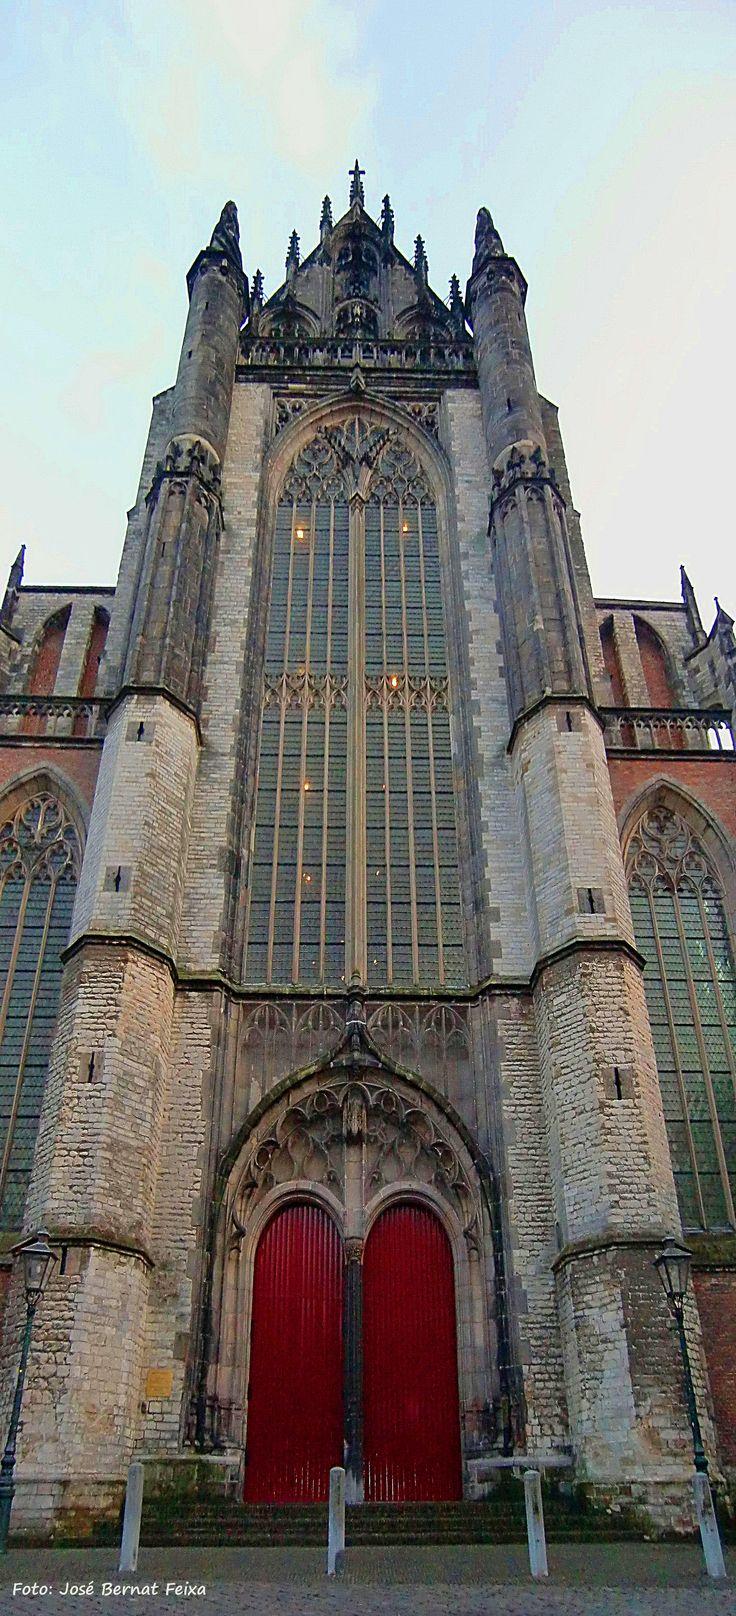 Hooglandse Kerk, Leiden